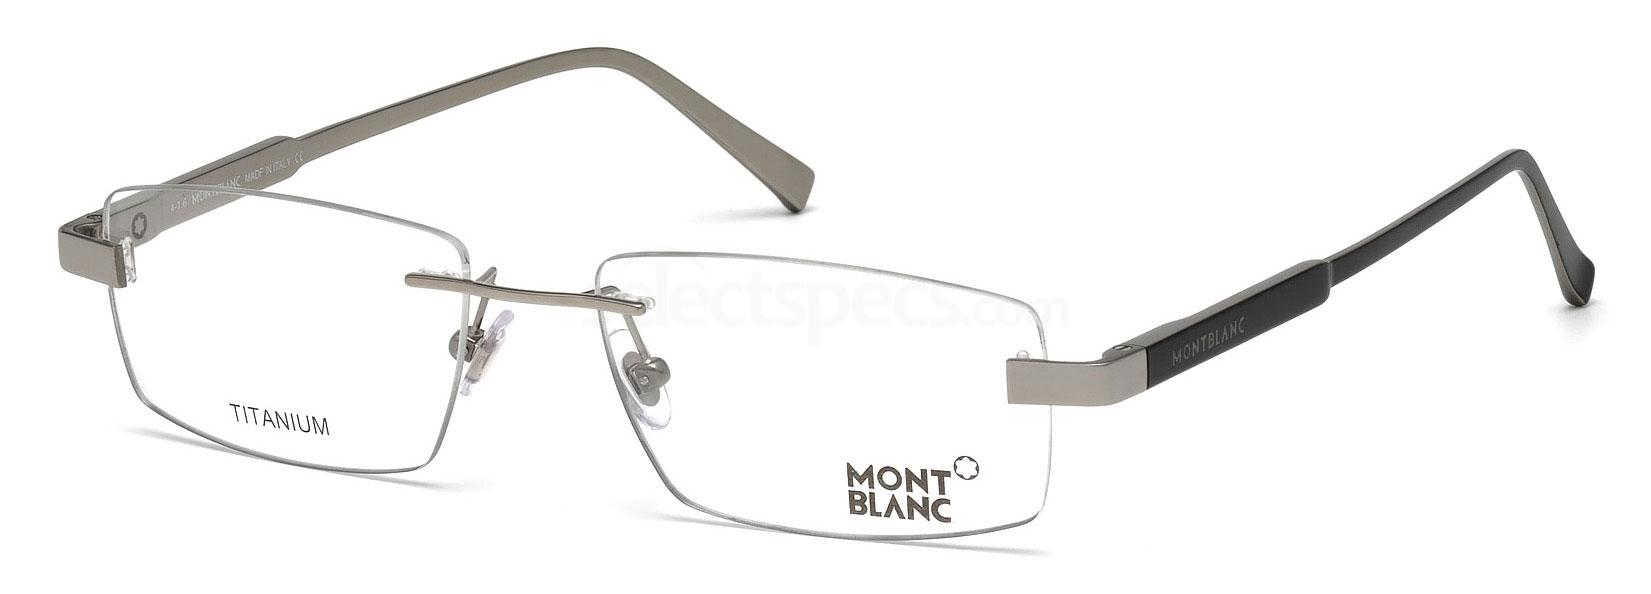 016 MB0661 Glasses, Mont Blanc